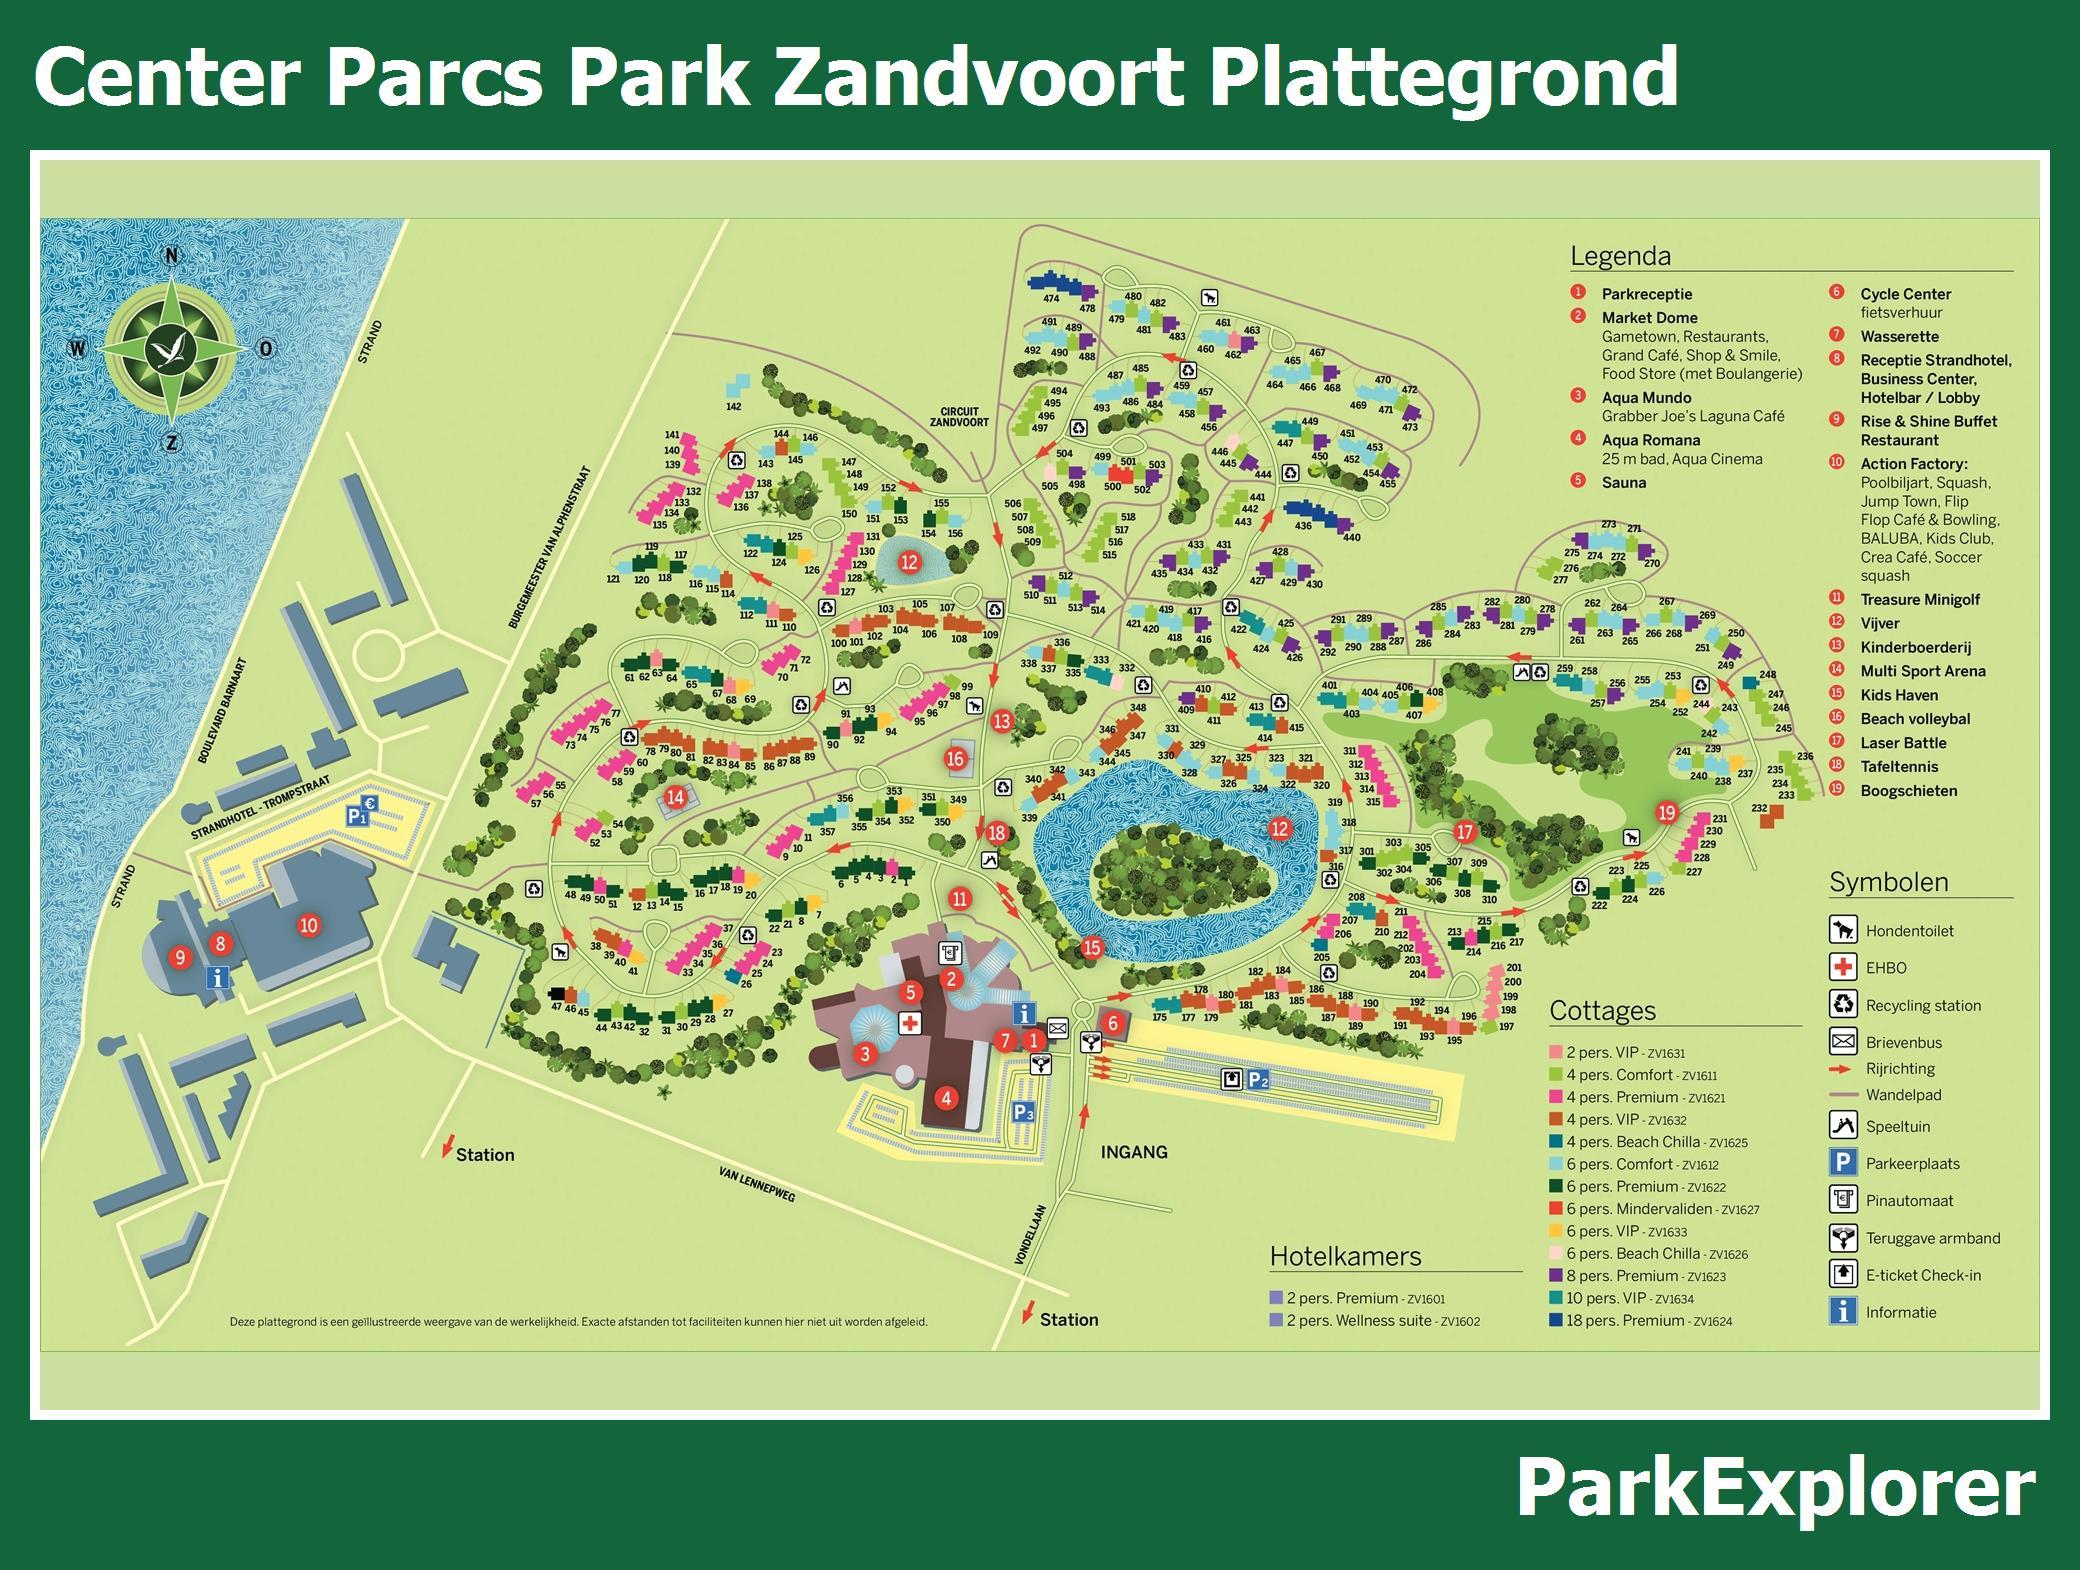 Center Parcs Zandvoort Zwembad.Px Park Plattegrond Van Center Parcs Park Zandvoort Parkexplorer Nl